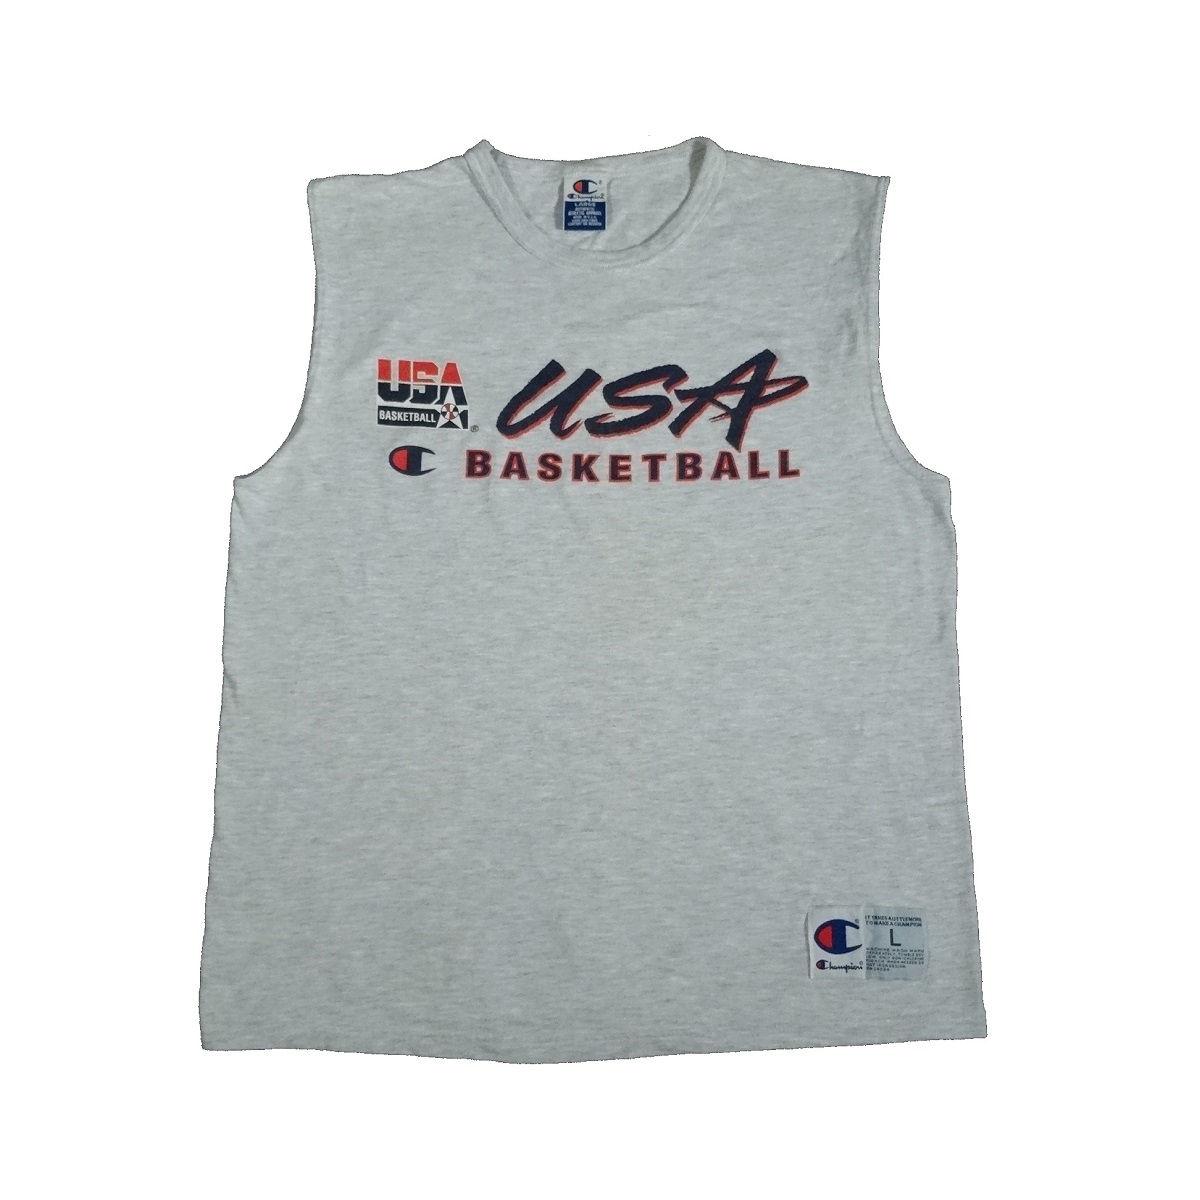 usa basketball dream team vintage sleeveless t shirt front